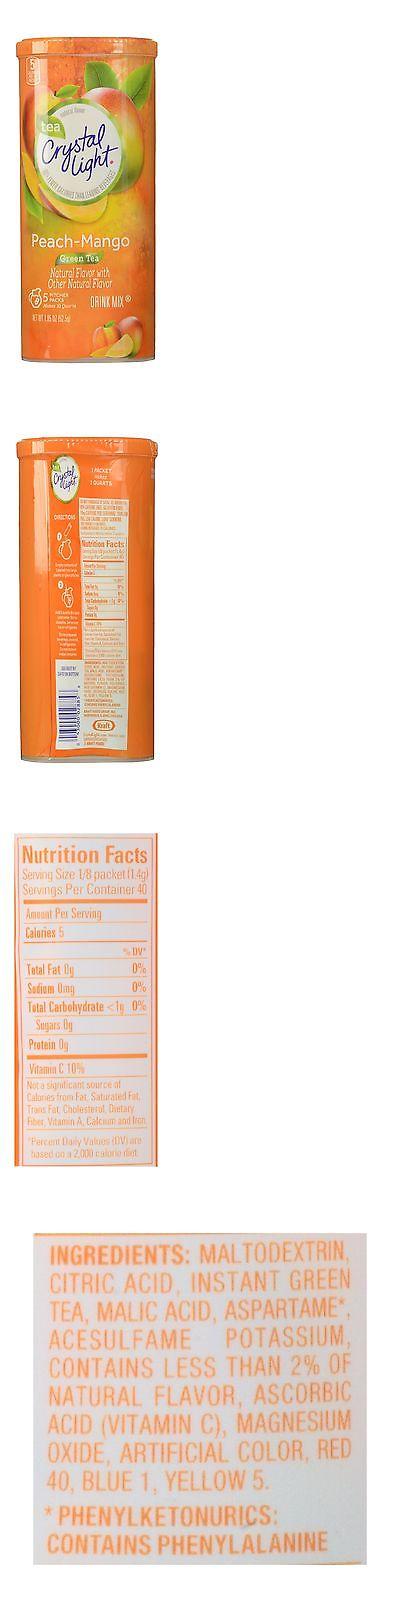 Drink Mixes 179192: Crystal Light Drink Mix Peach Mango Green Tea Pitcher  Packets 5 Count